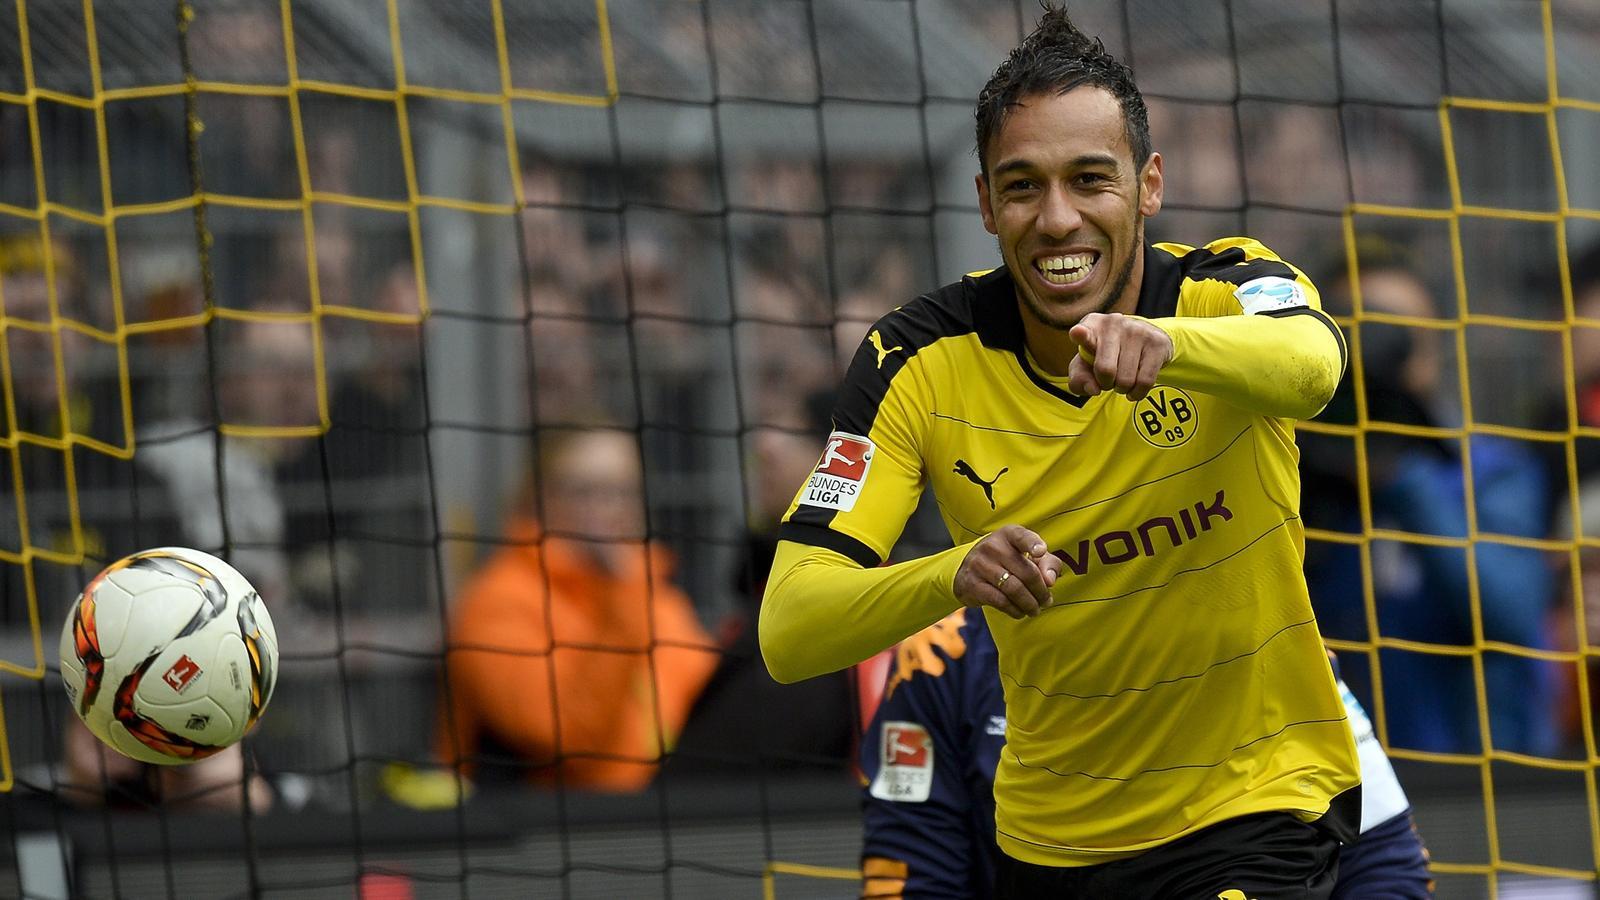 Borussia Dortmund striker Pierre Emerick Aubameyang dampens Real